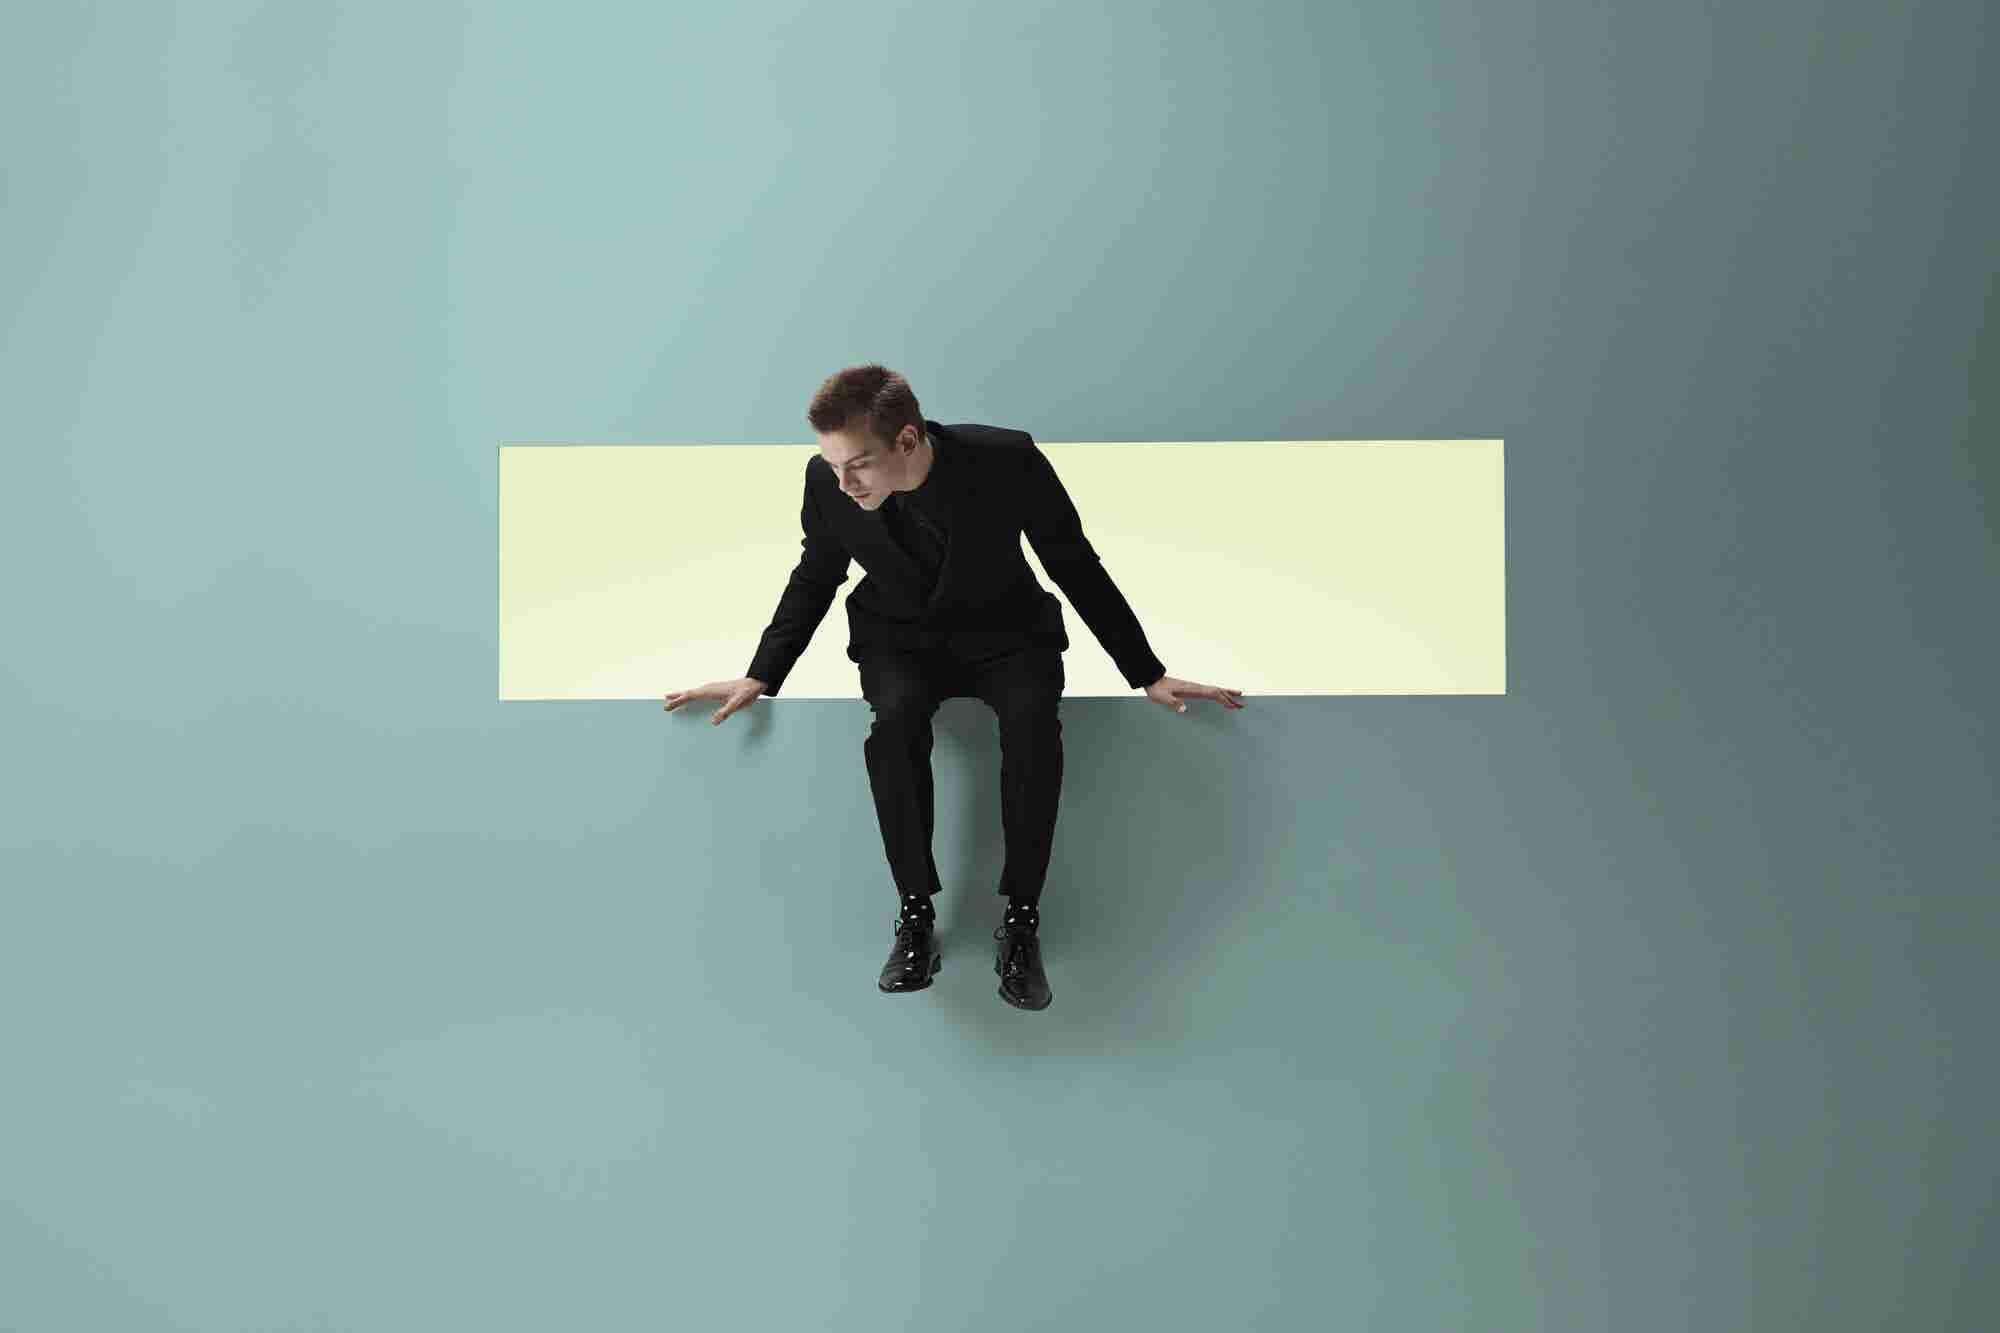 Don't Let Entrepreneurship Push You Over The Edge